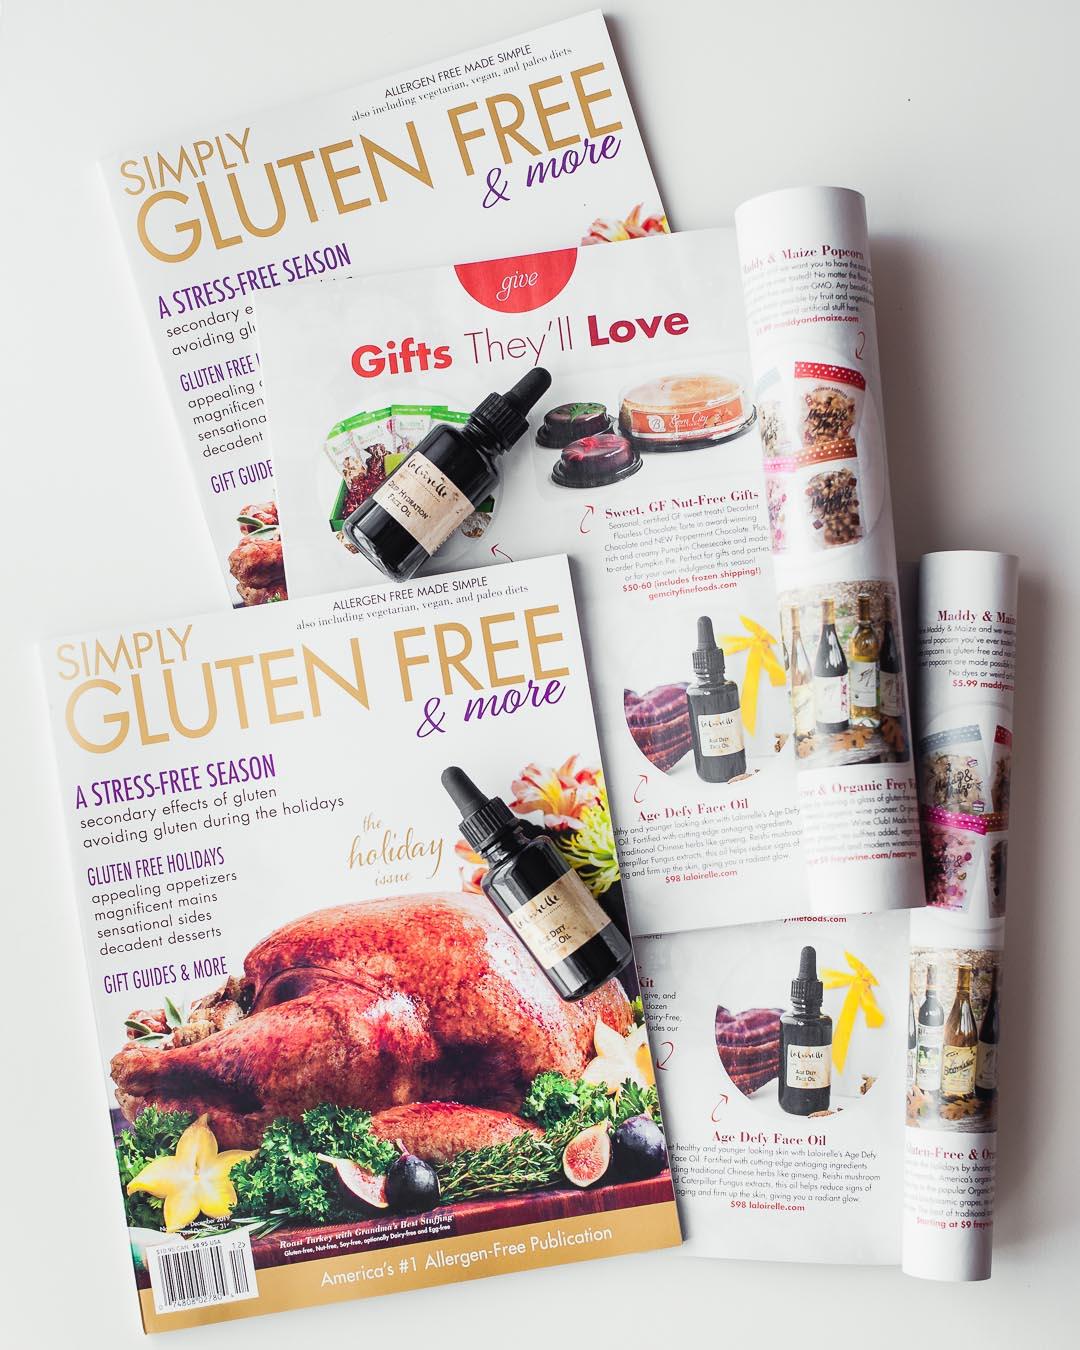 Simply Gluten Free feature - Laloirelle